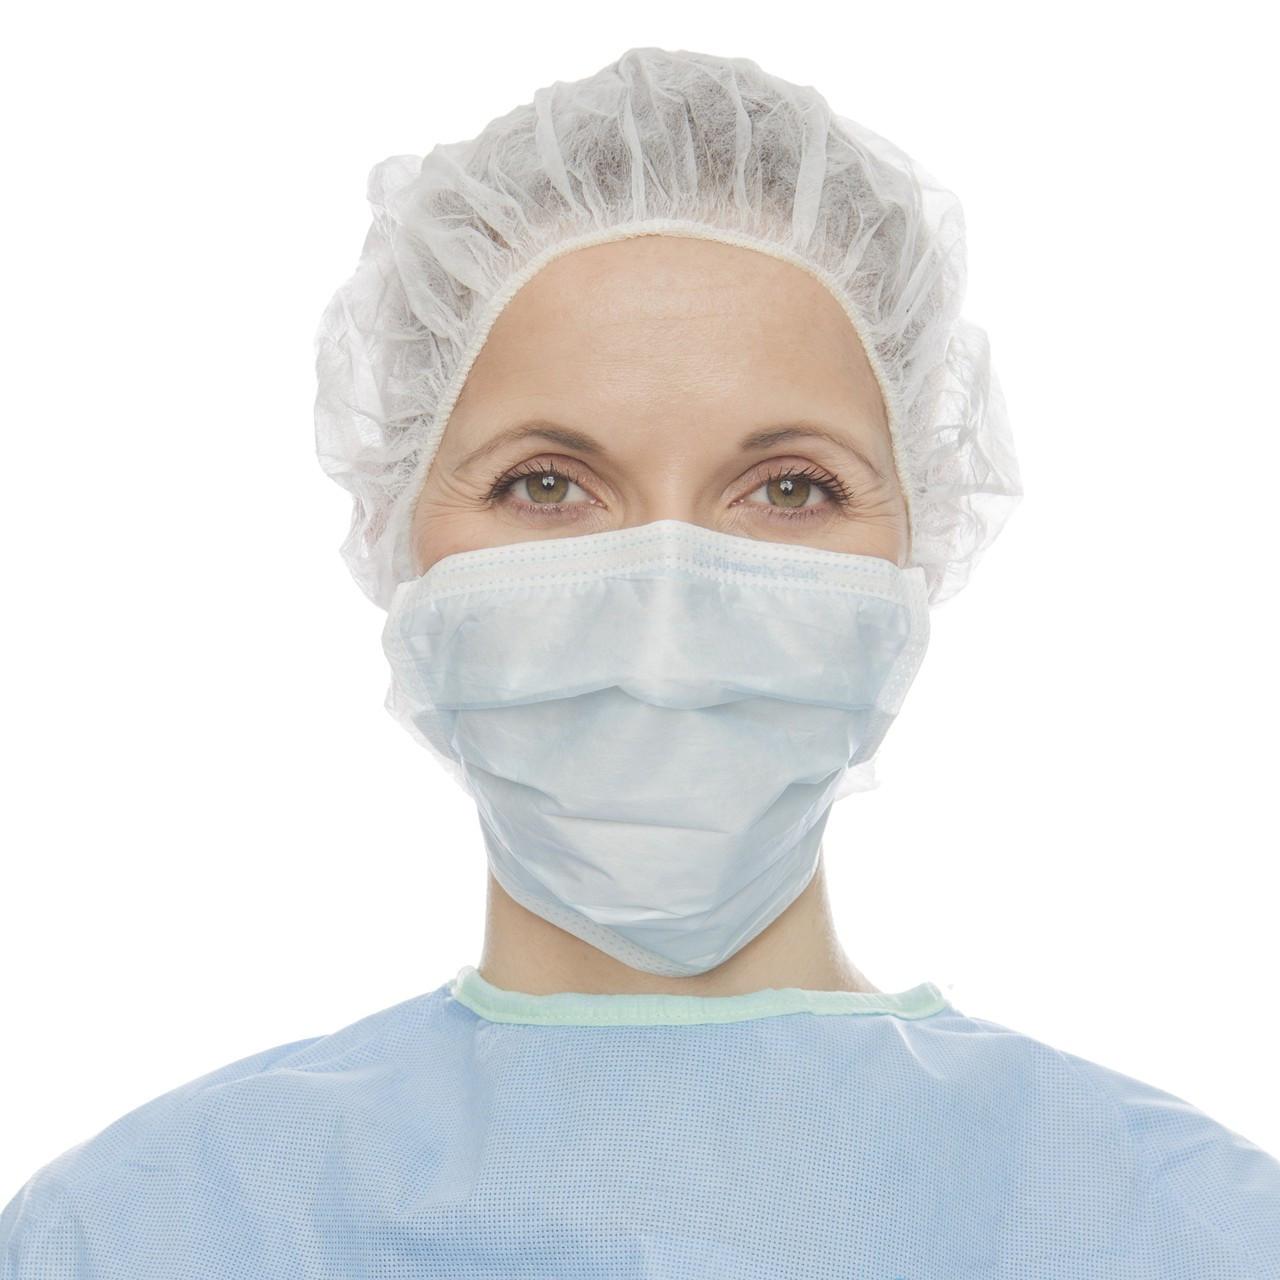 Mask Pleat Health Halyard Blue Style Basics Surgical